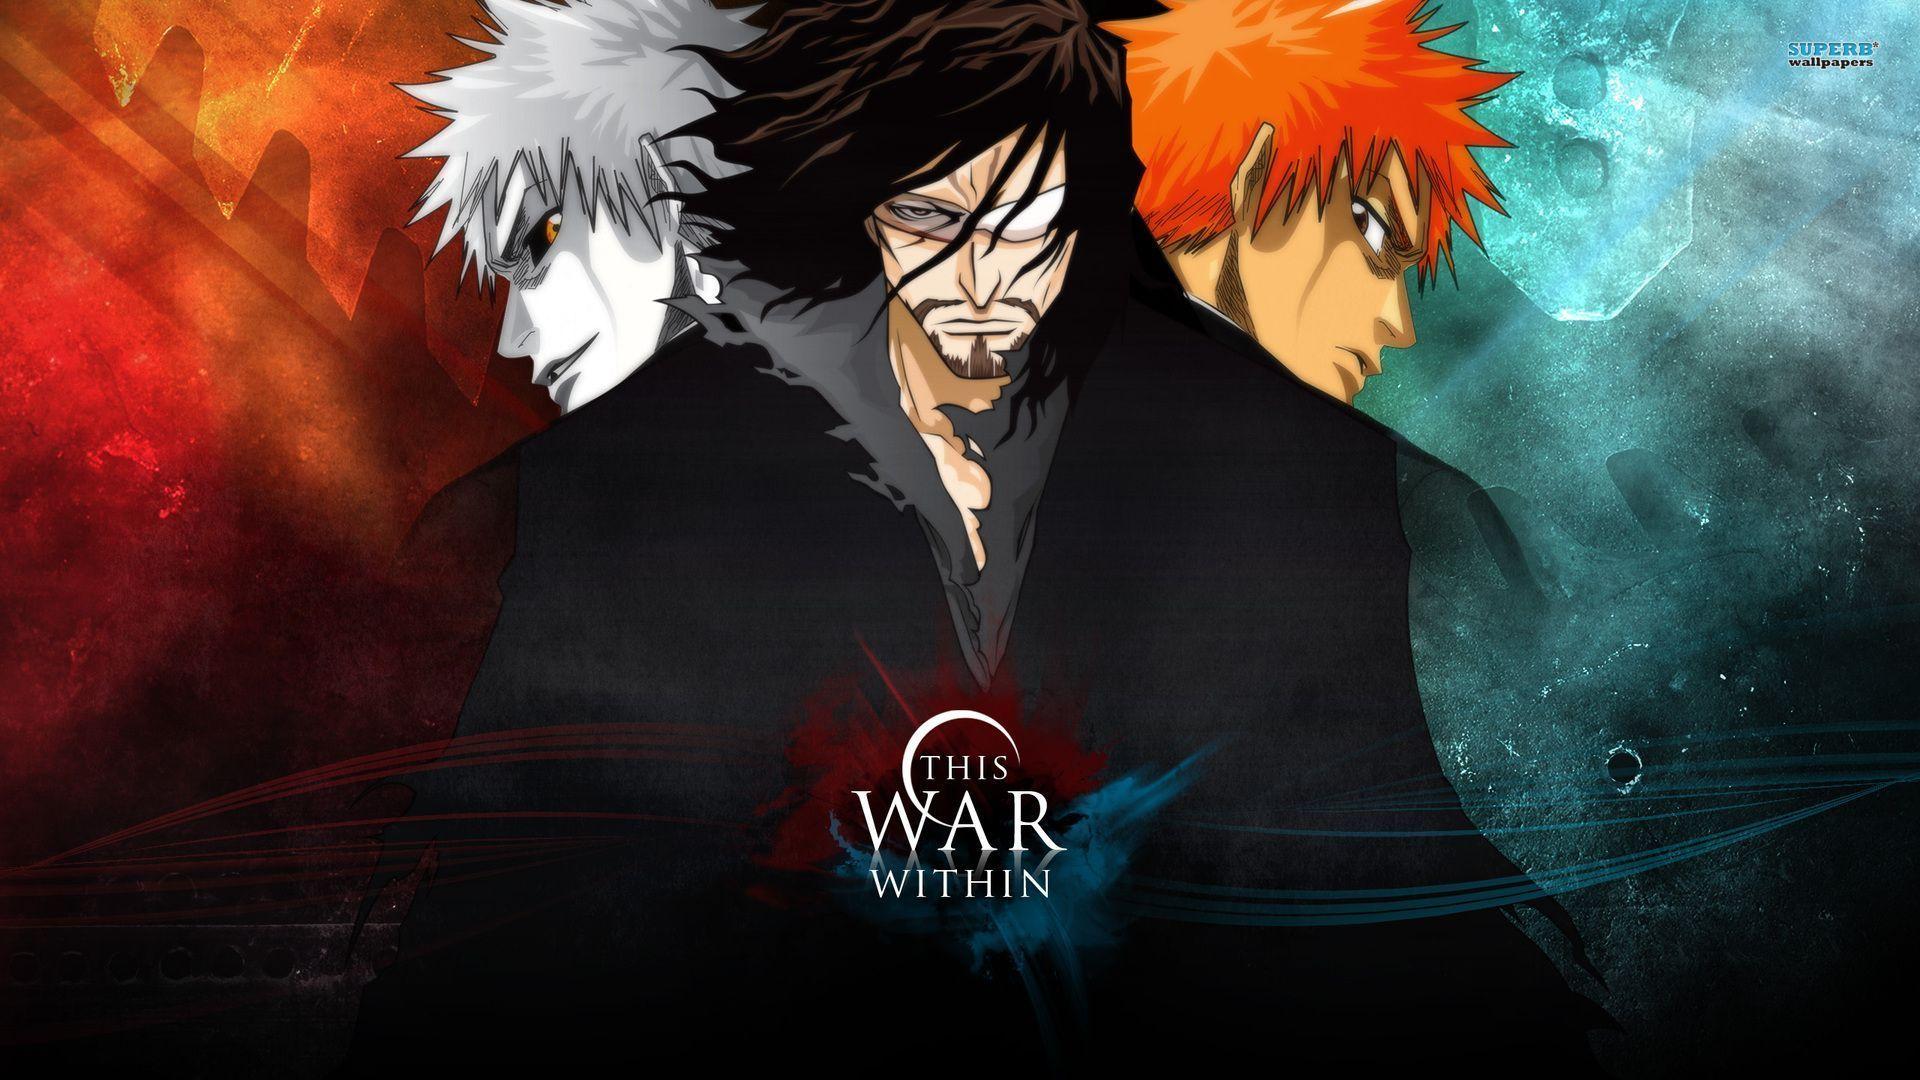 Best-Anime-Bleach-Ichigo-Kurosaki-Image-Picture-Gallery-HQ-1080p-Desktop-HD-wallpaper-wp3603201